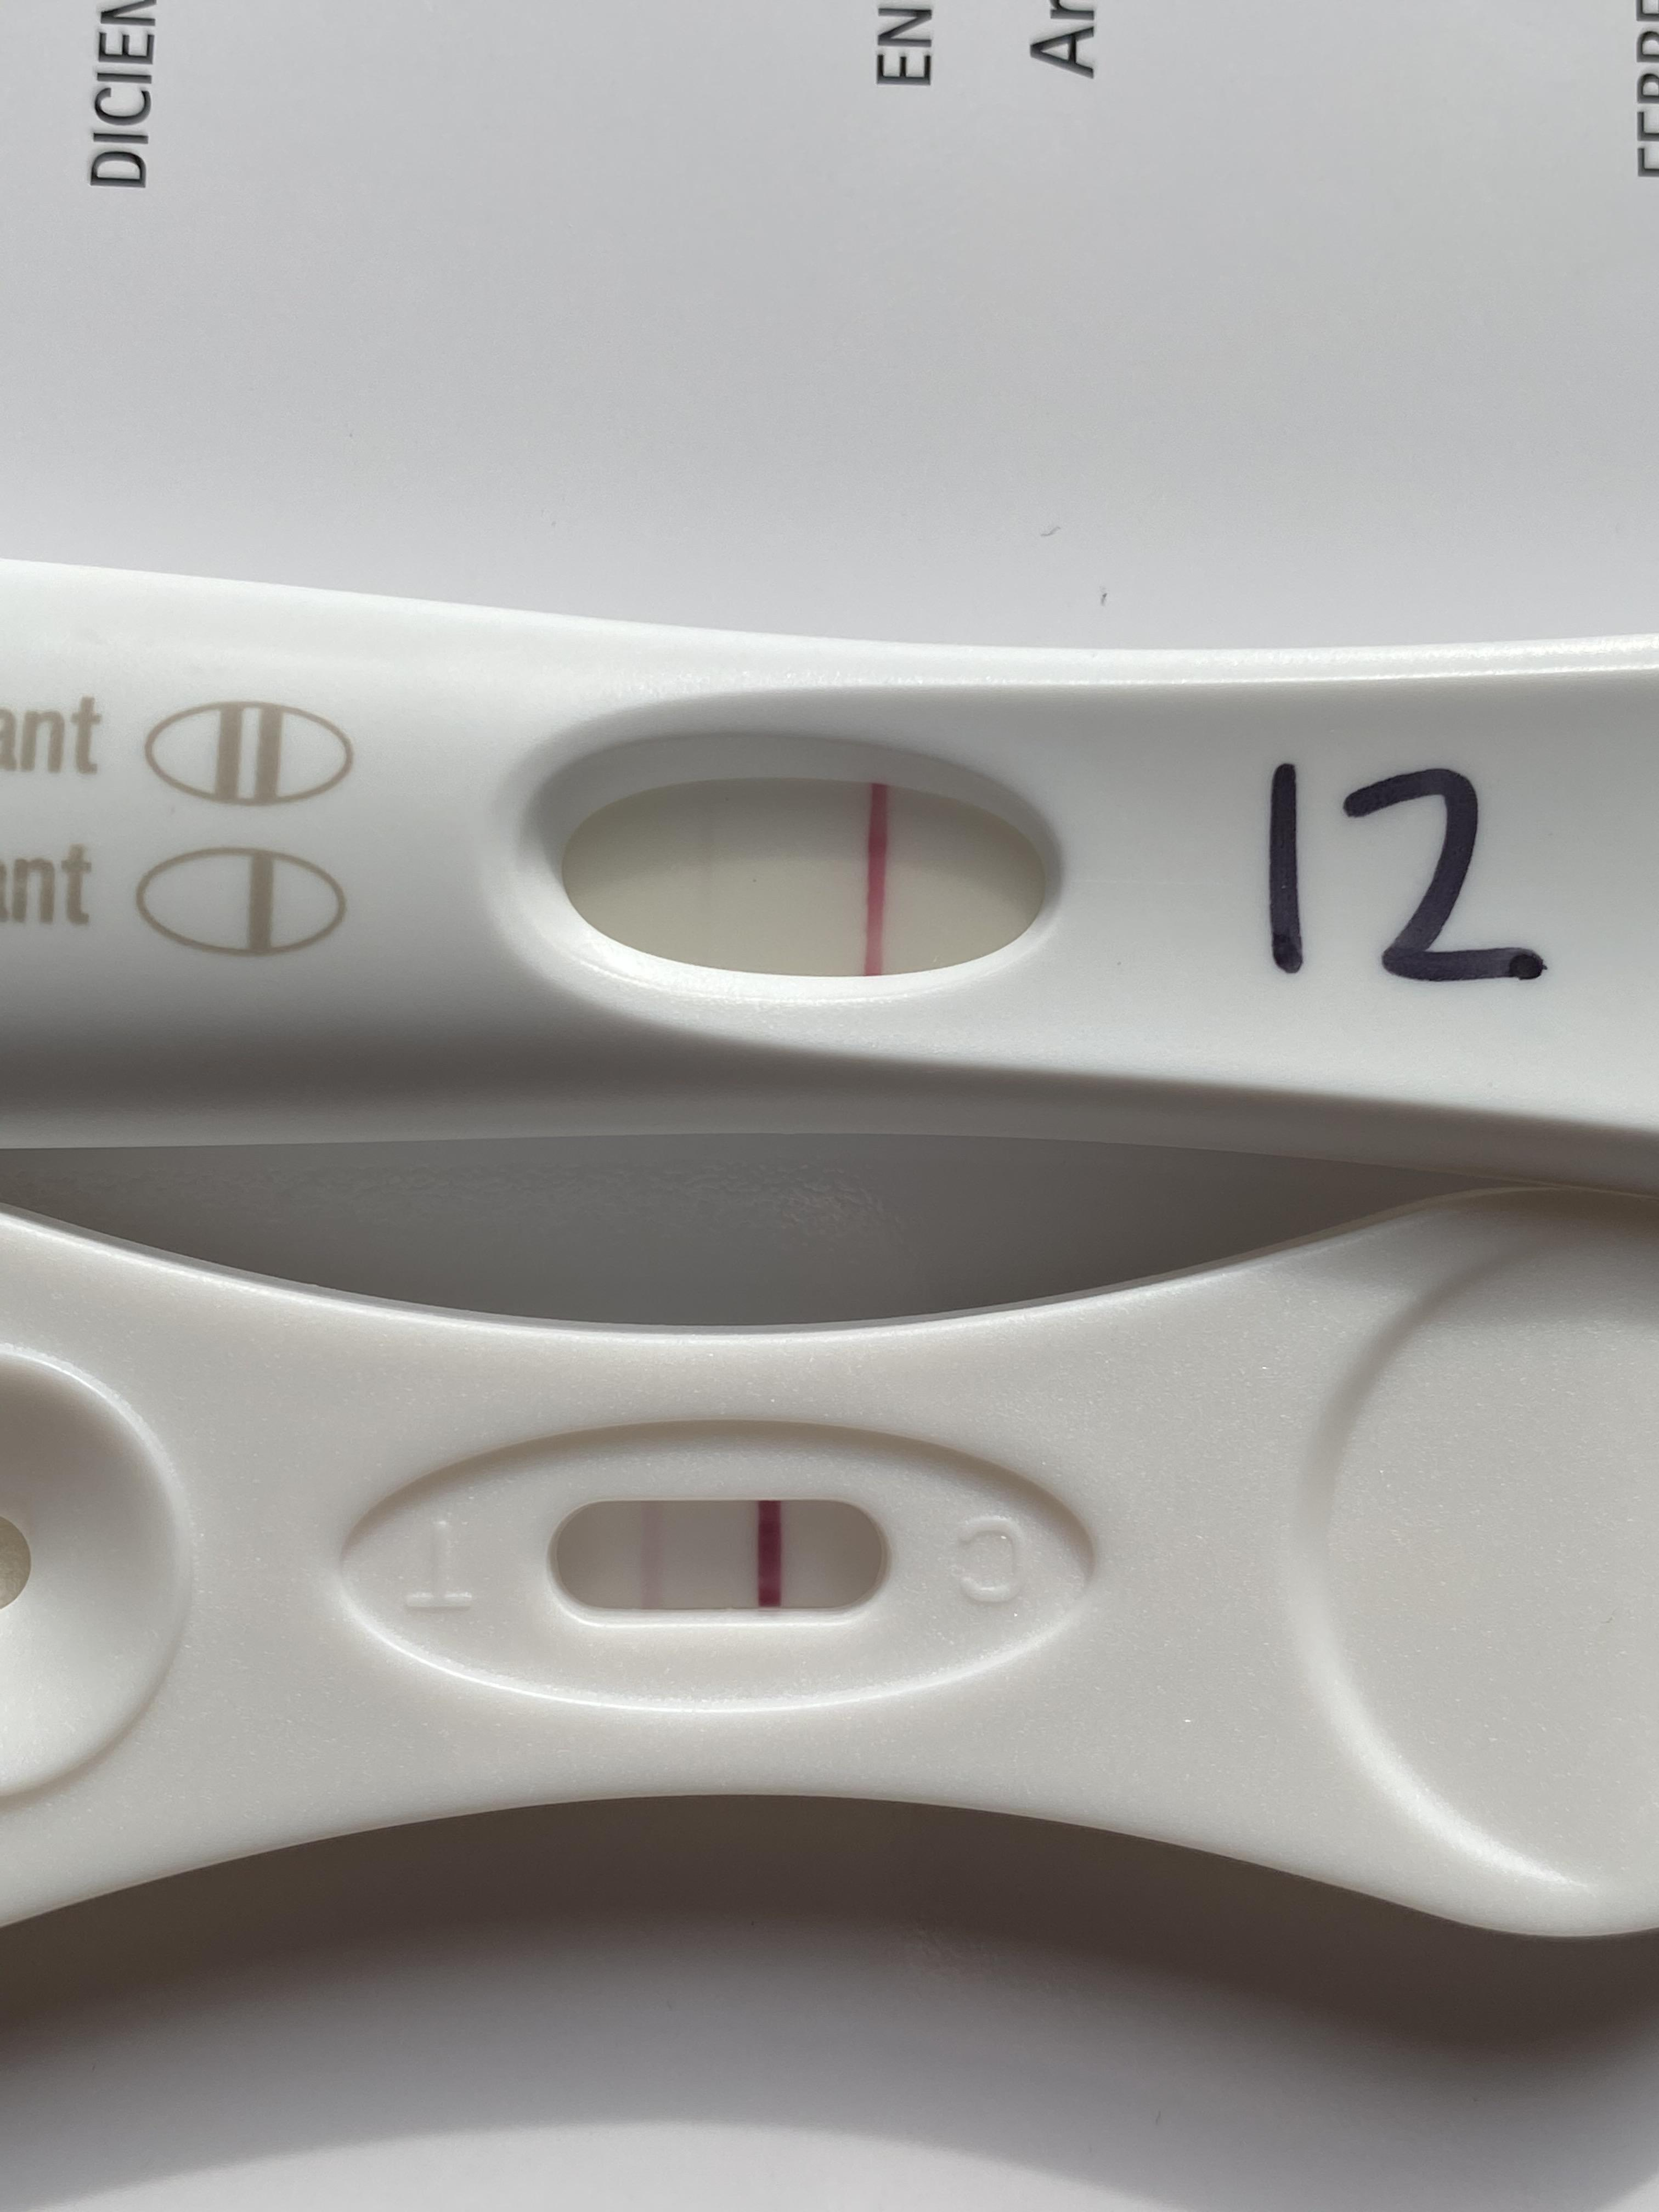 Veriquick Pregnancy Test Positive : veriquick, pregnancy, positive, 12DPO, Faint, Obvious, Dollar, Veriquick, Progression., TFABLinePorn